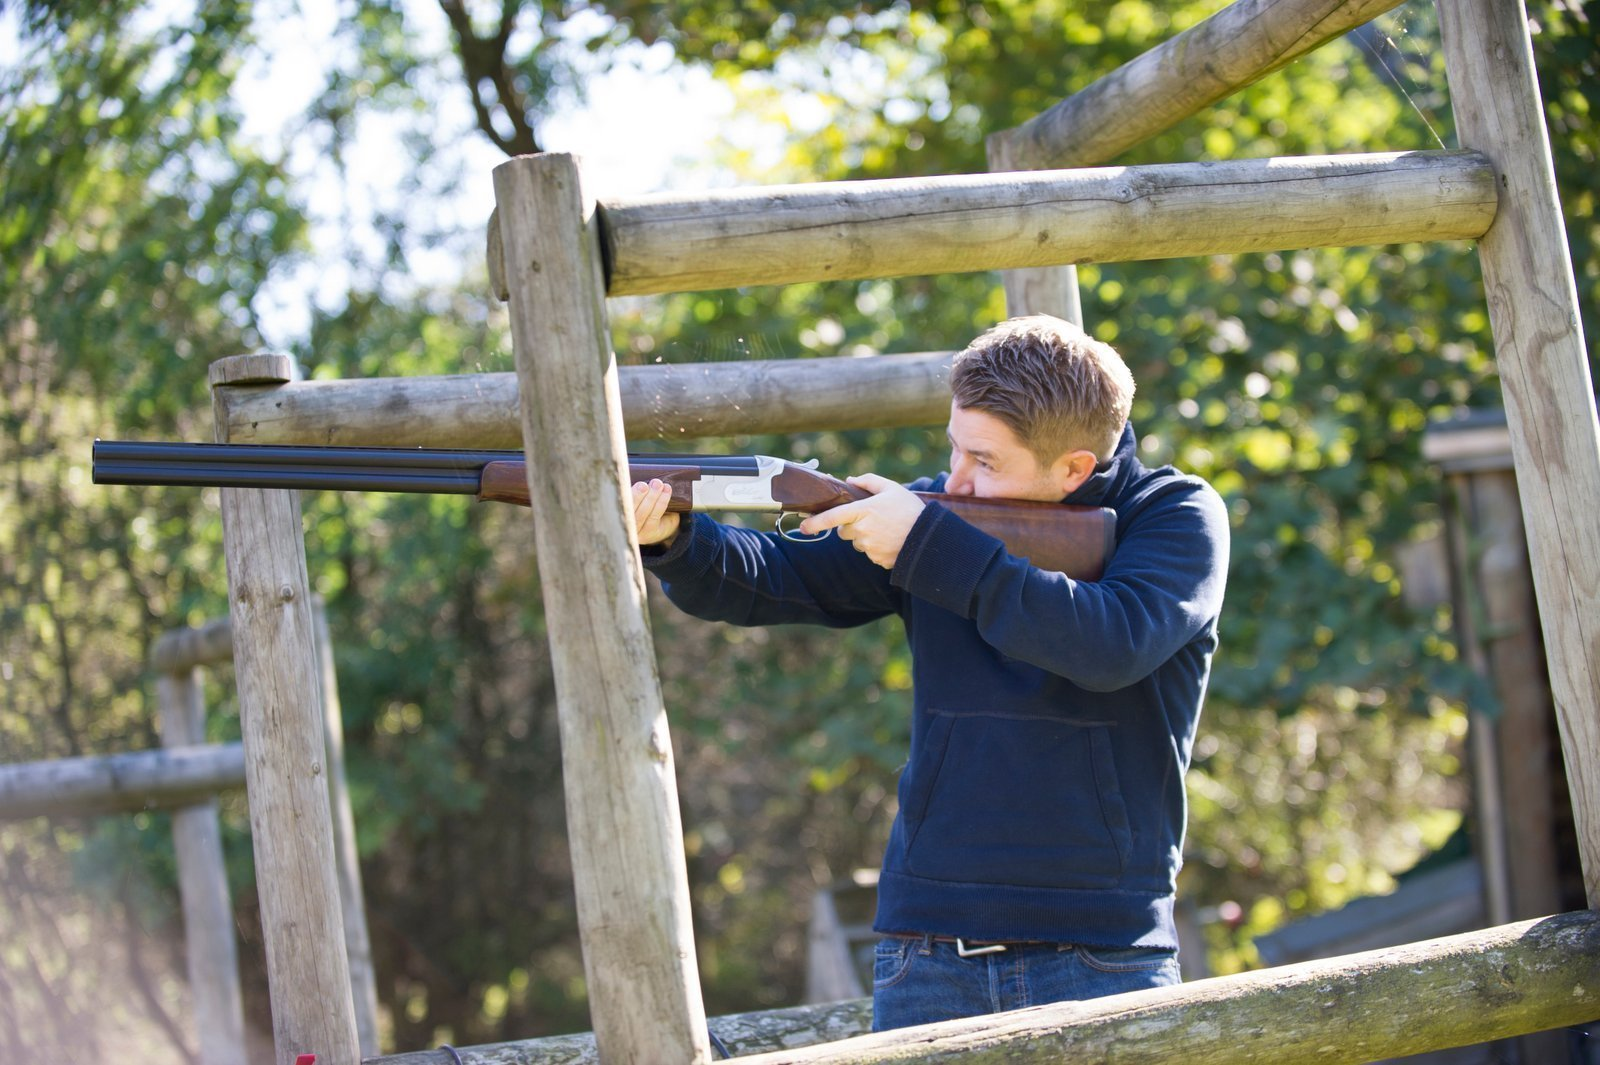 clay pigeon shooting, shooting, cumbria, shooting in cumbria, clay pigeon, wild boar, the wild boar inn